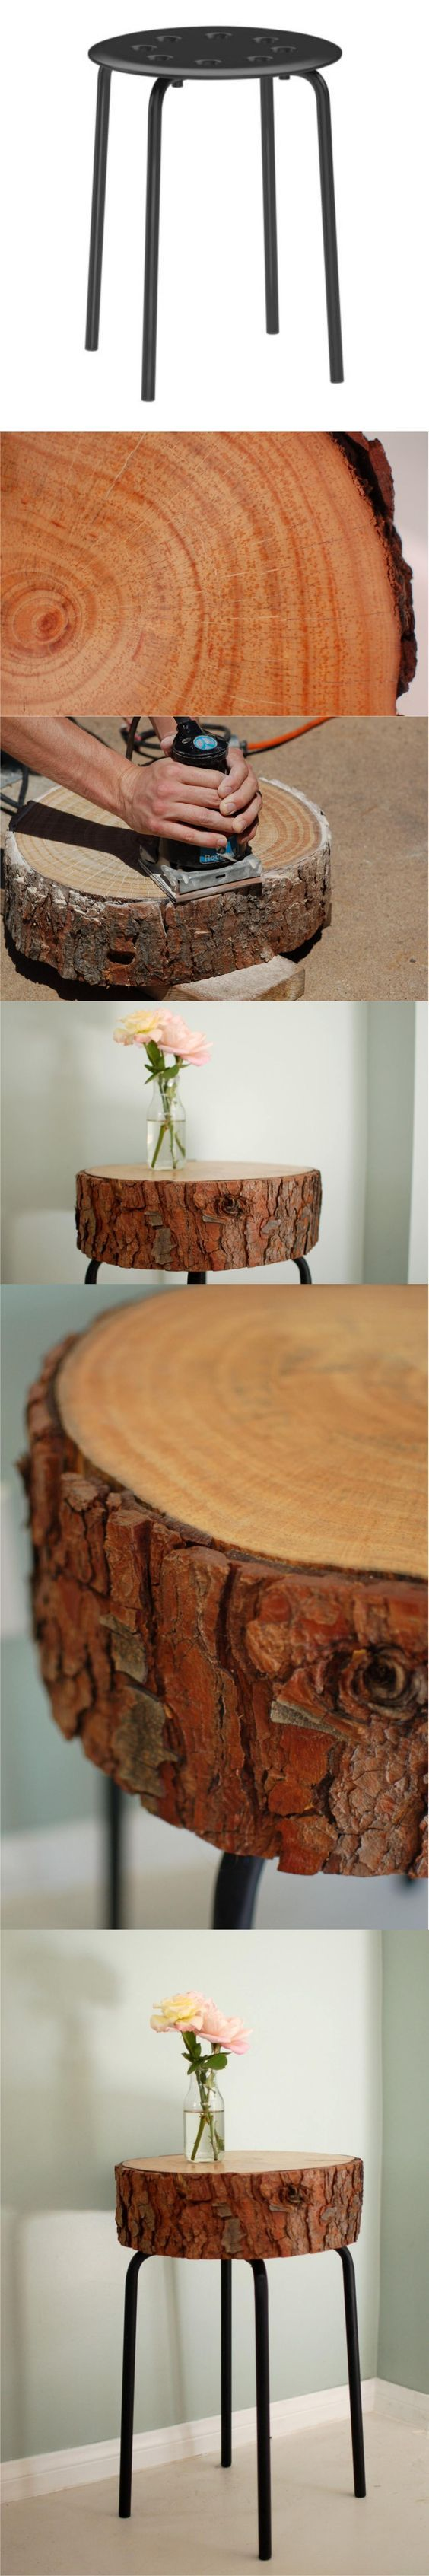 inventive ikea hack table: